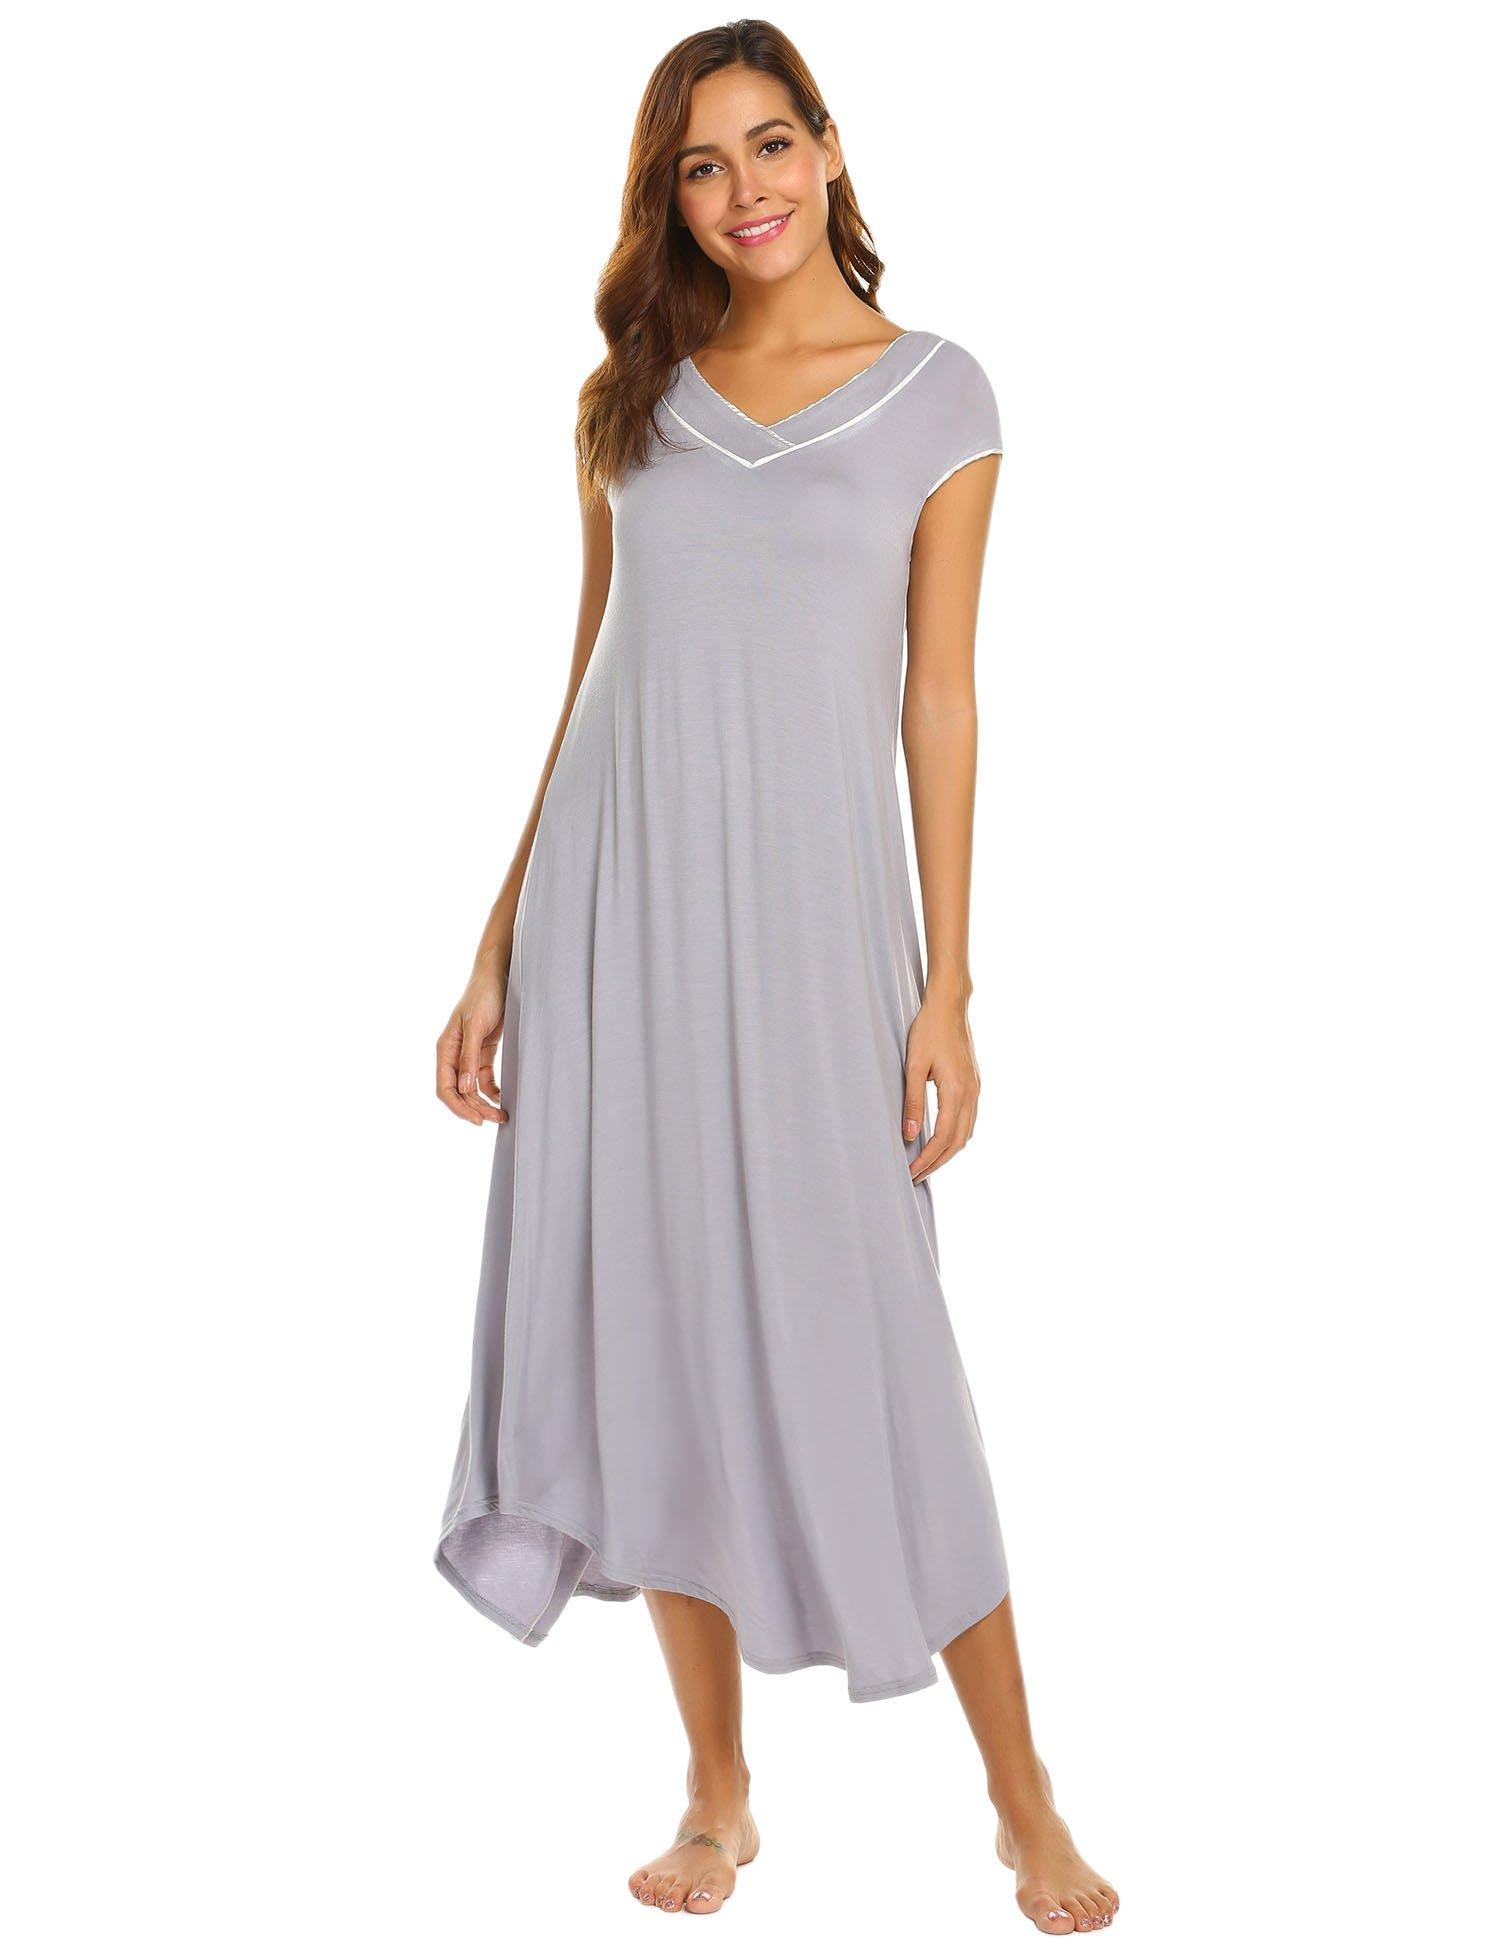 Ekouaer Womens Long Nightgown Short Sleeve Nightshirt Full Length Lounge Dress Grey XX-Large by Ekouaer